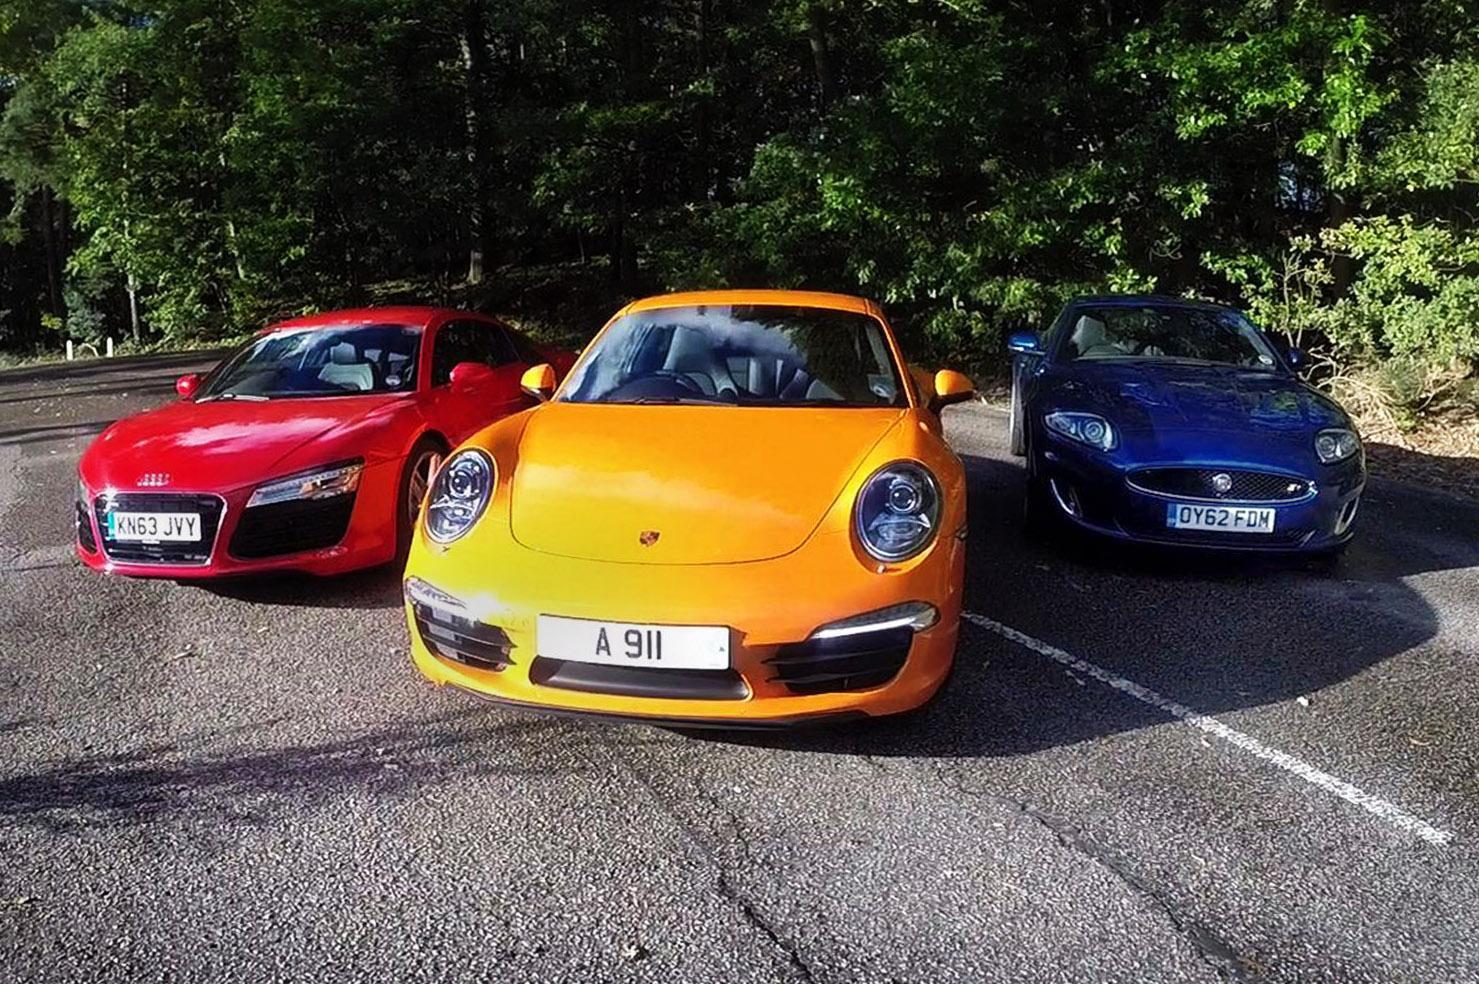 Everyday supercar test: Porsche 911 vs Audi R8 vs Jaguar XKR